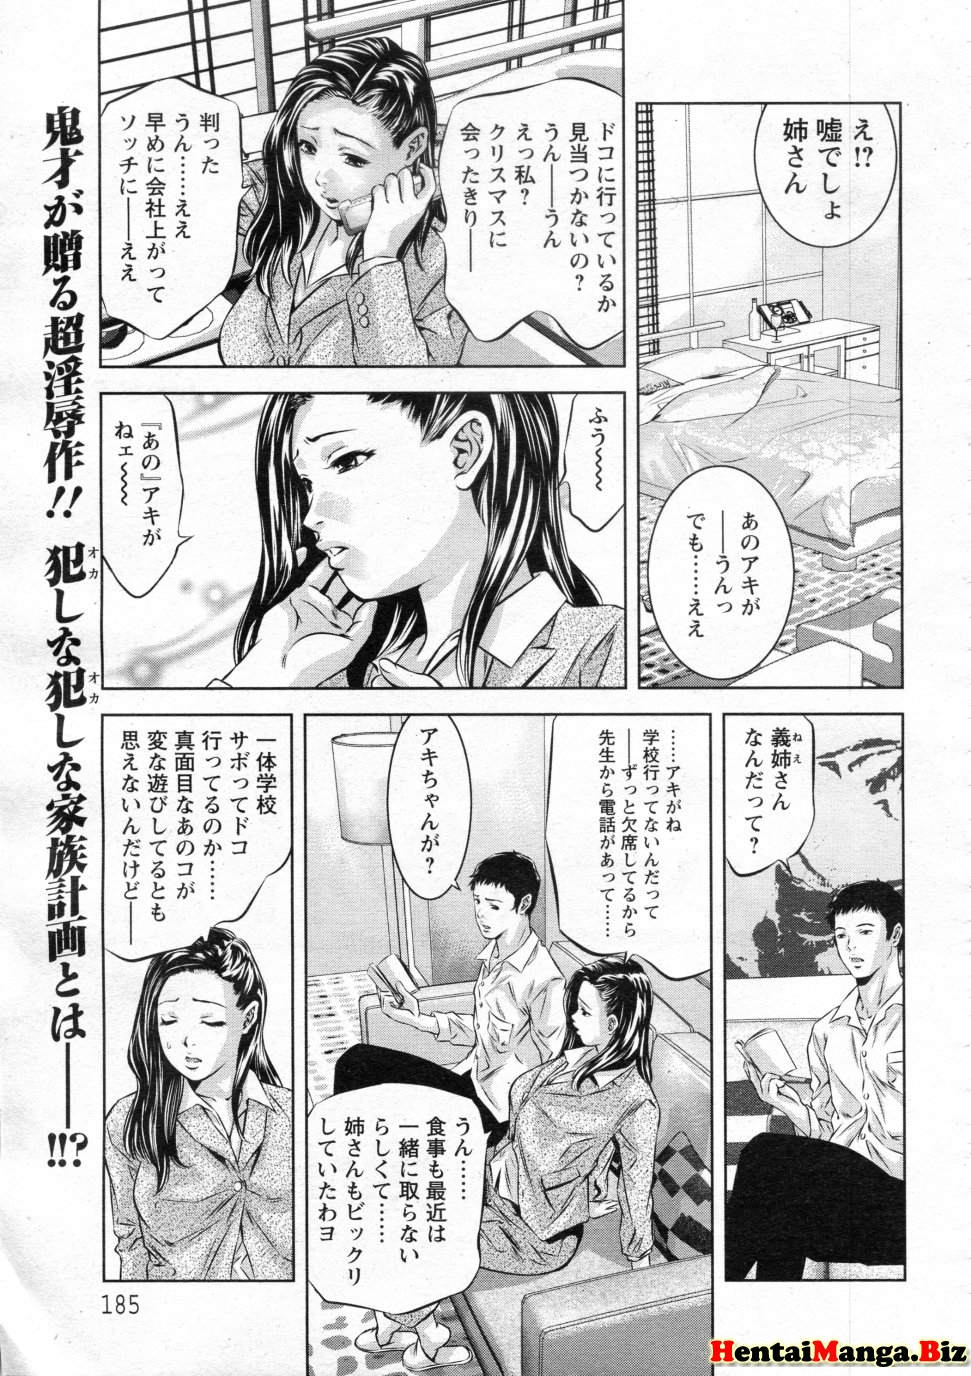 Incest Hentai - [鬼窪浩久] 正しい家族の作り方-Read-Hentai-Manga-Onlnie